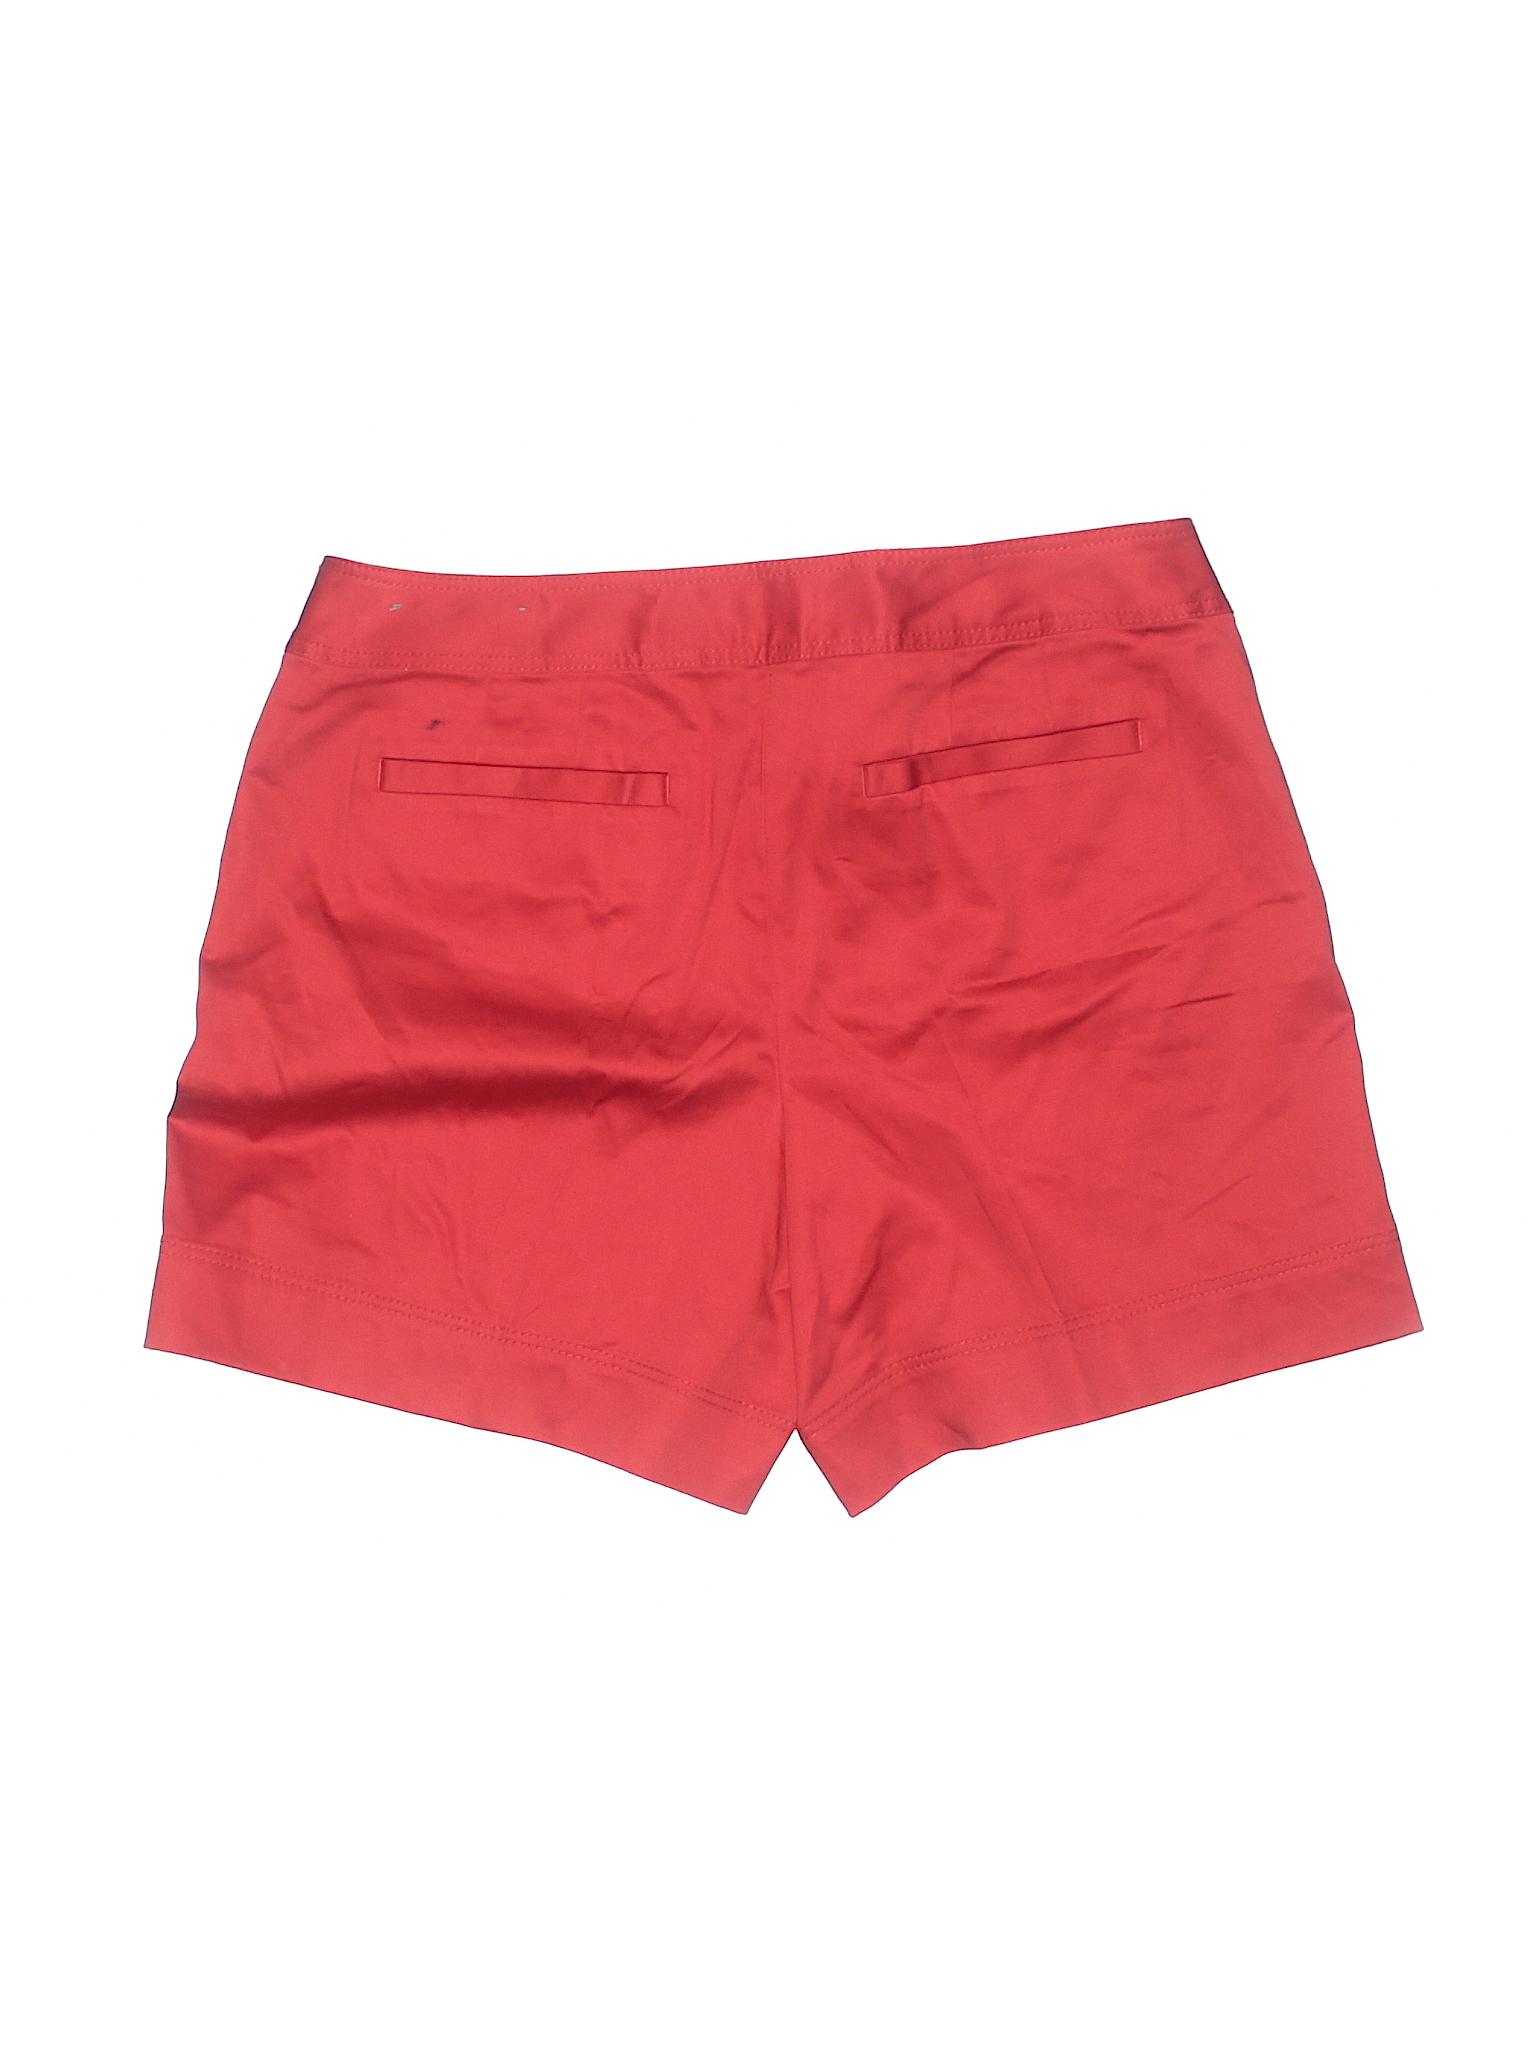 Factory Boutique Ann Khaki Shorts Taylor pqSTxX